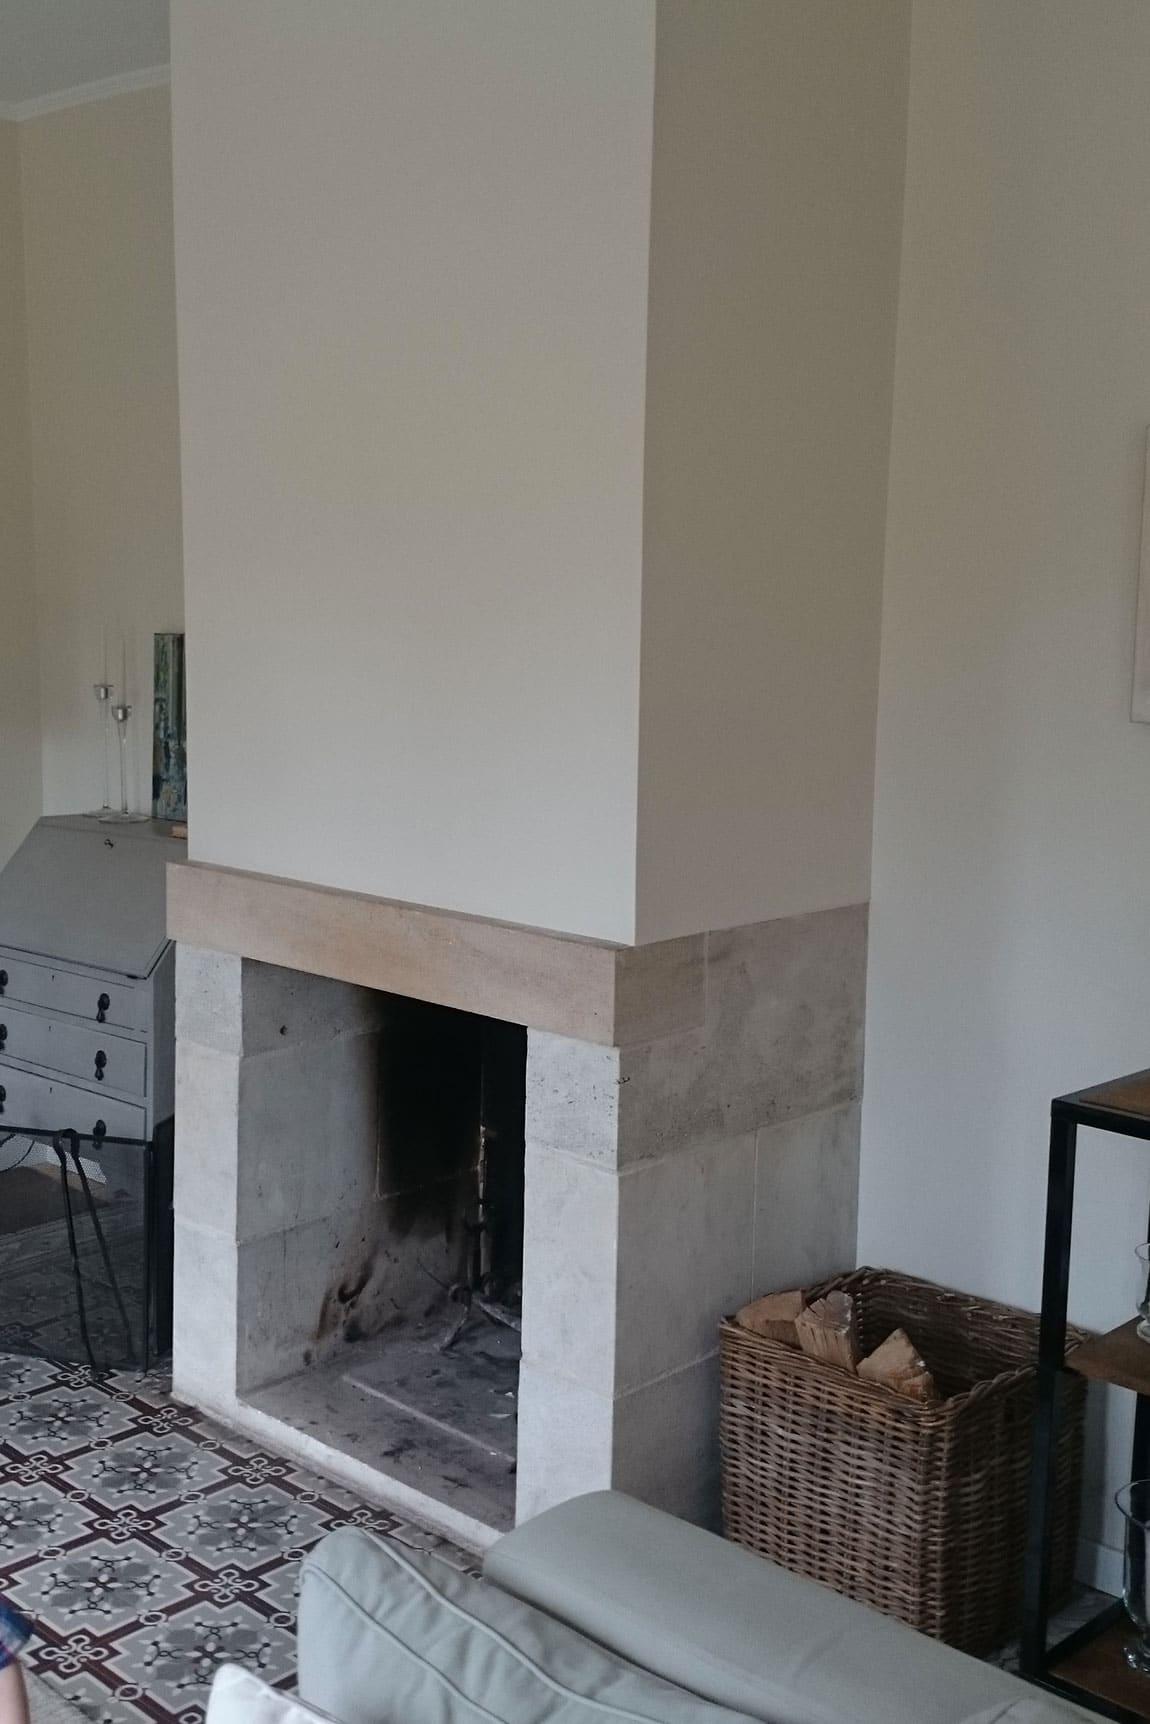 Cheminee Ouverte En Renovation Au Mesnil Esnard Origine Rouen